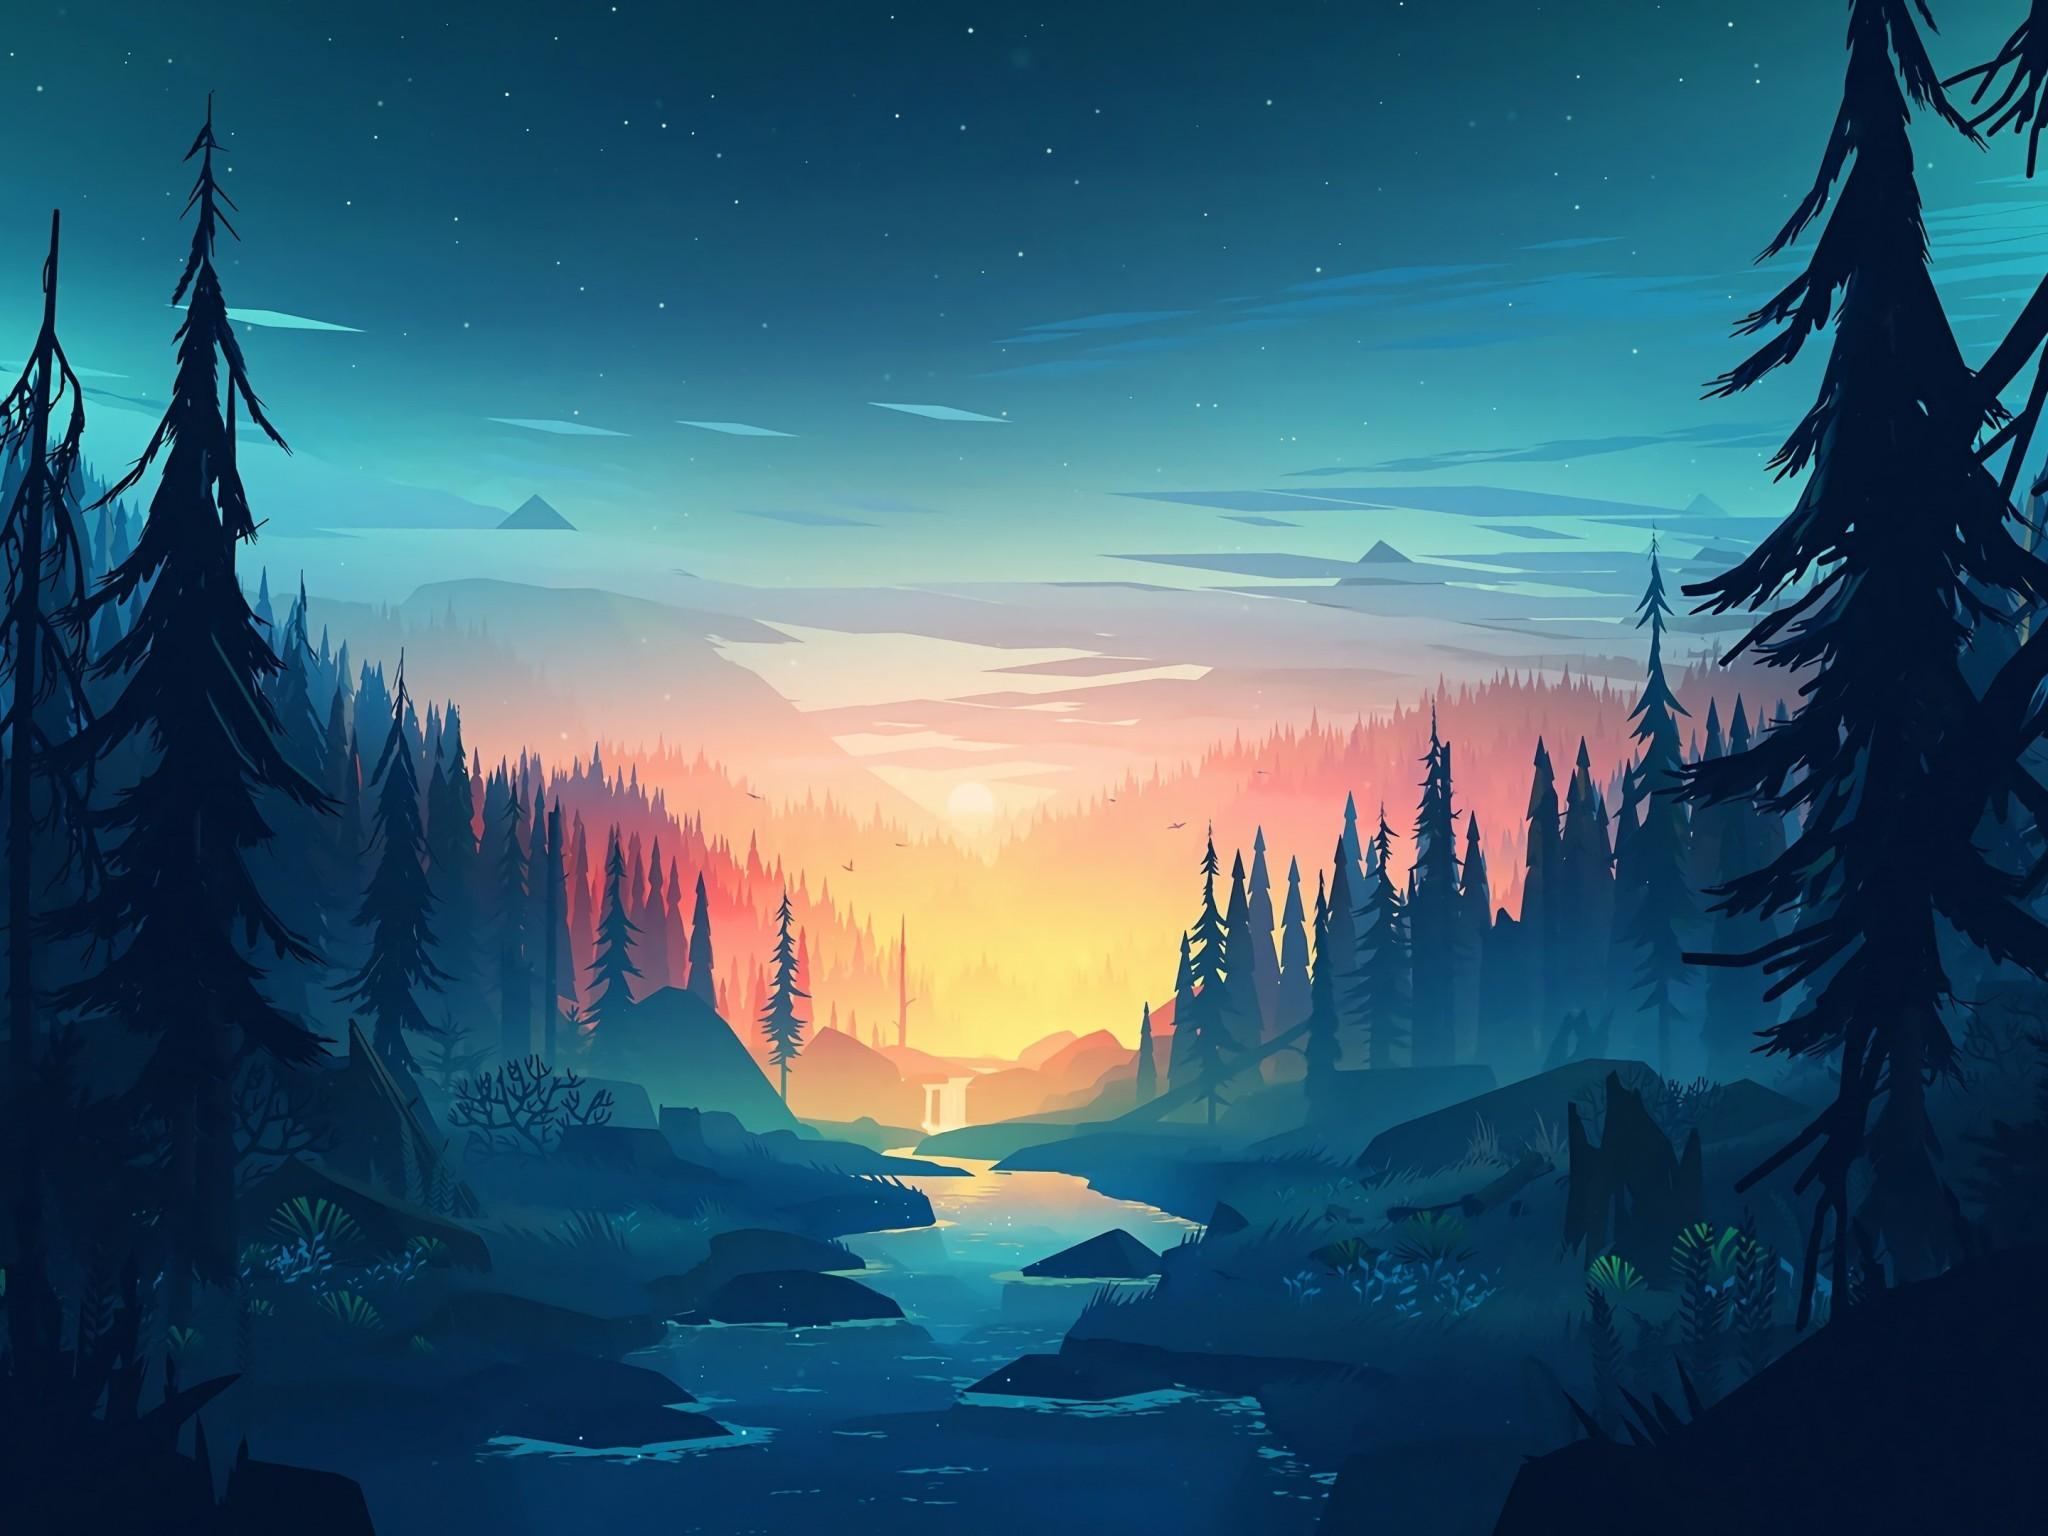 Download 2048x1536 Flat Landscape Minimalism Trees Sunset 2048x1536